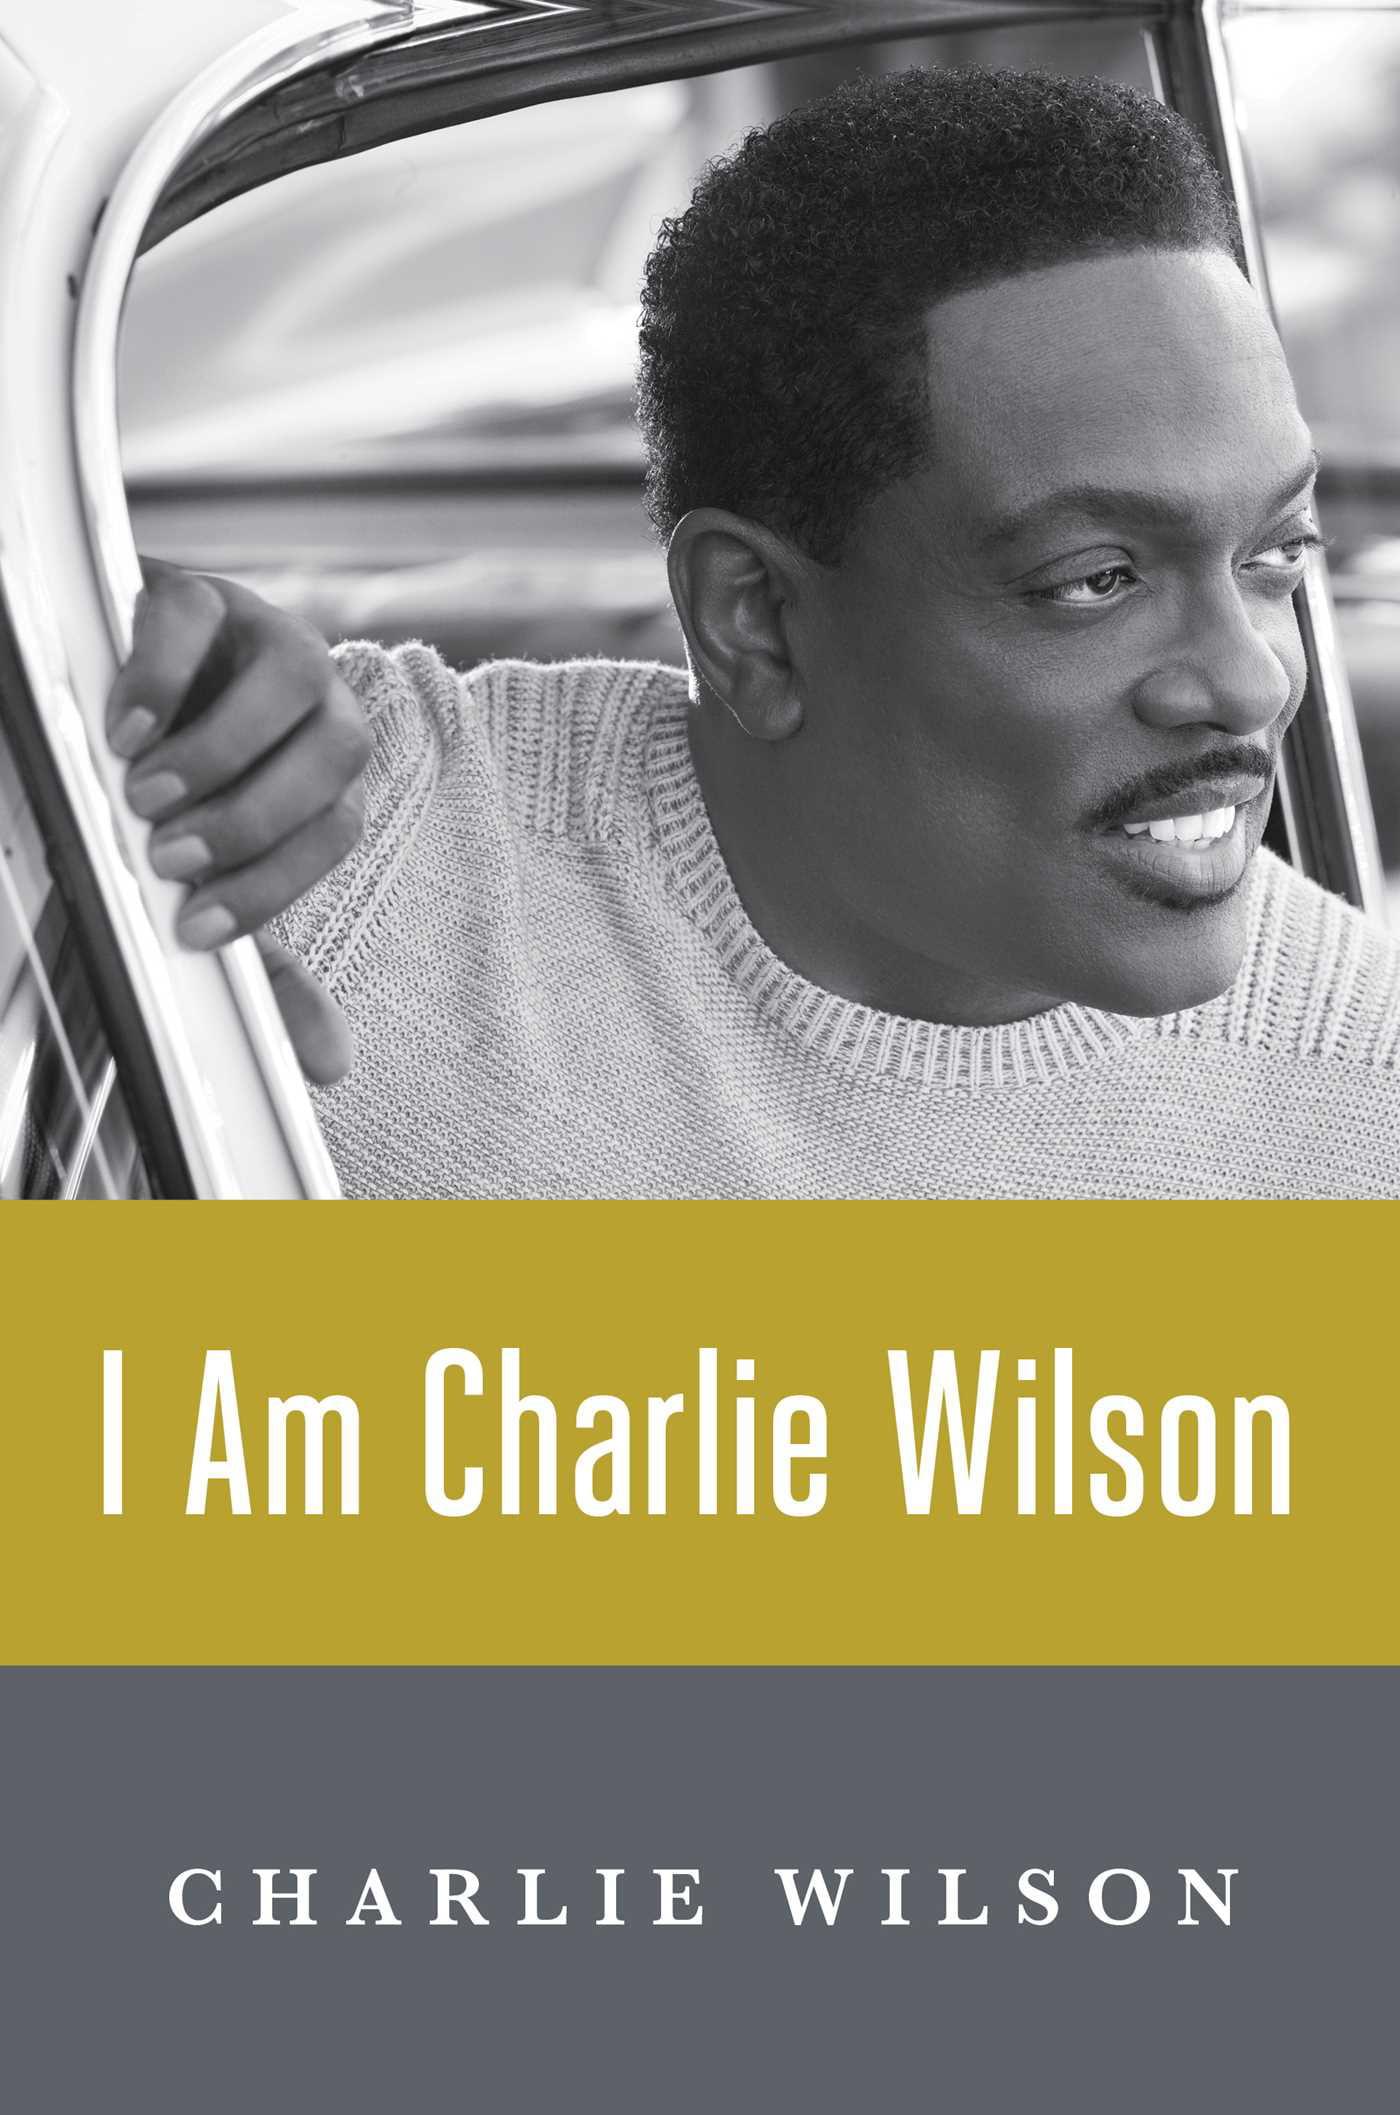 I AM CHARLIE WILSON EBOOK